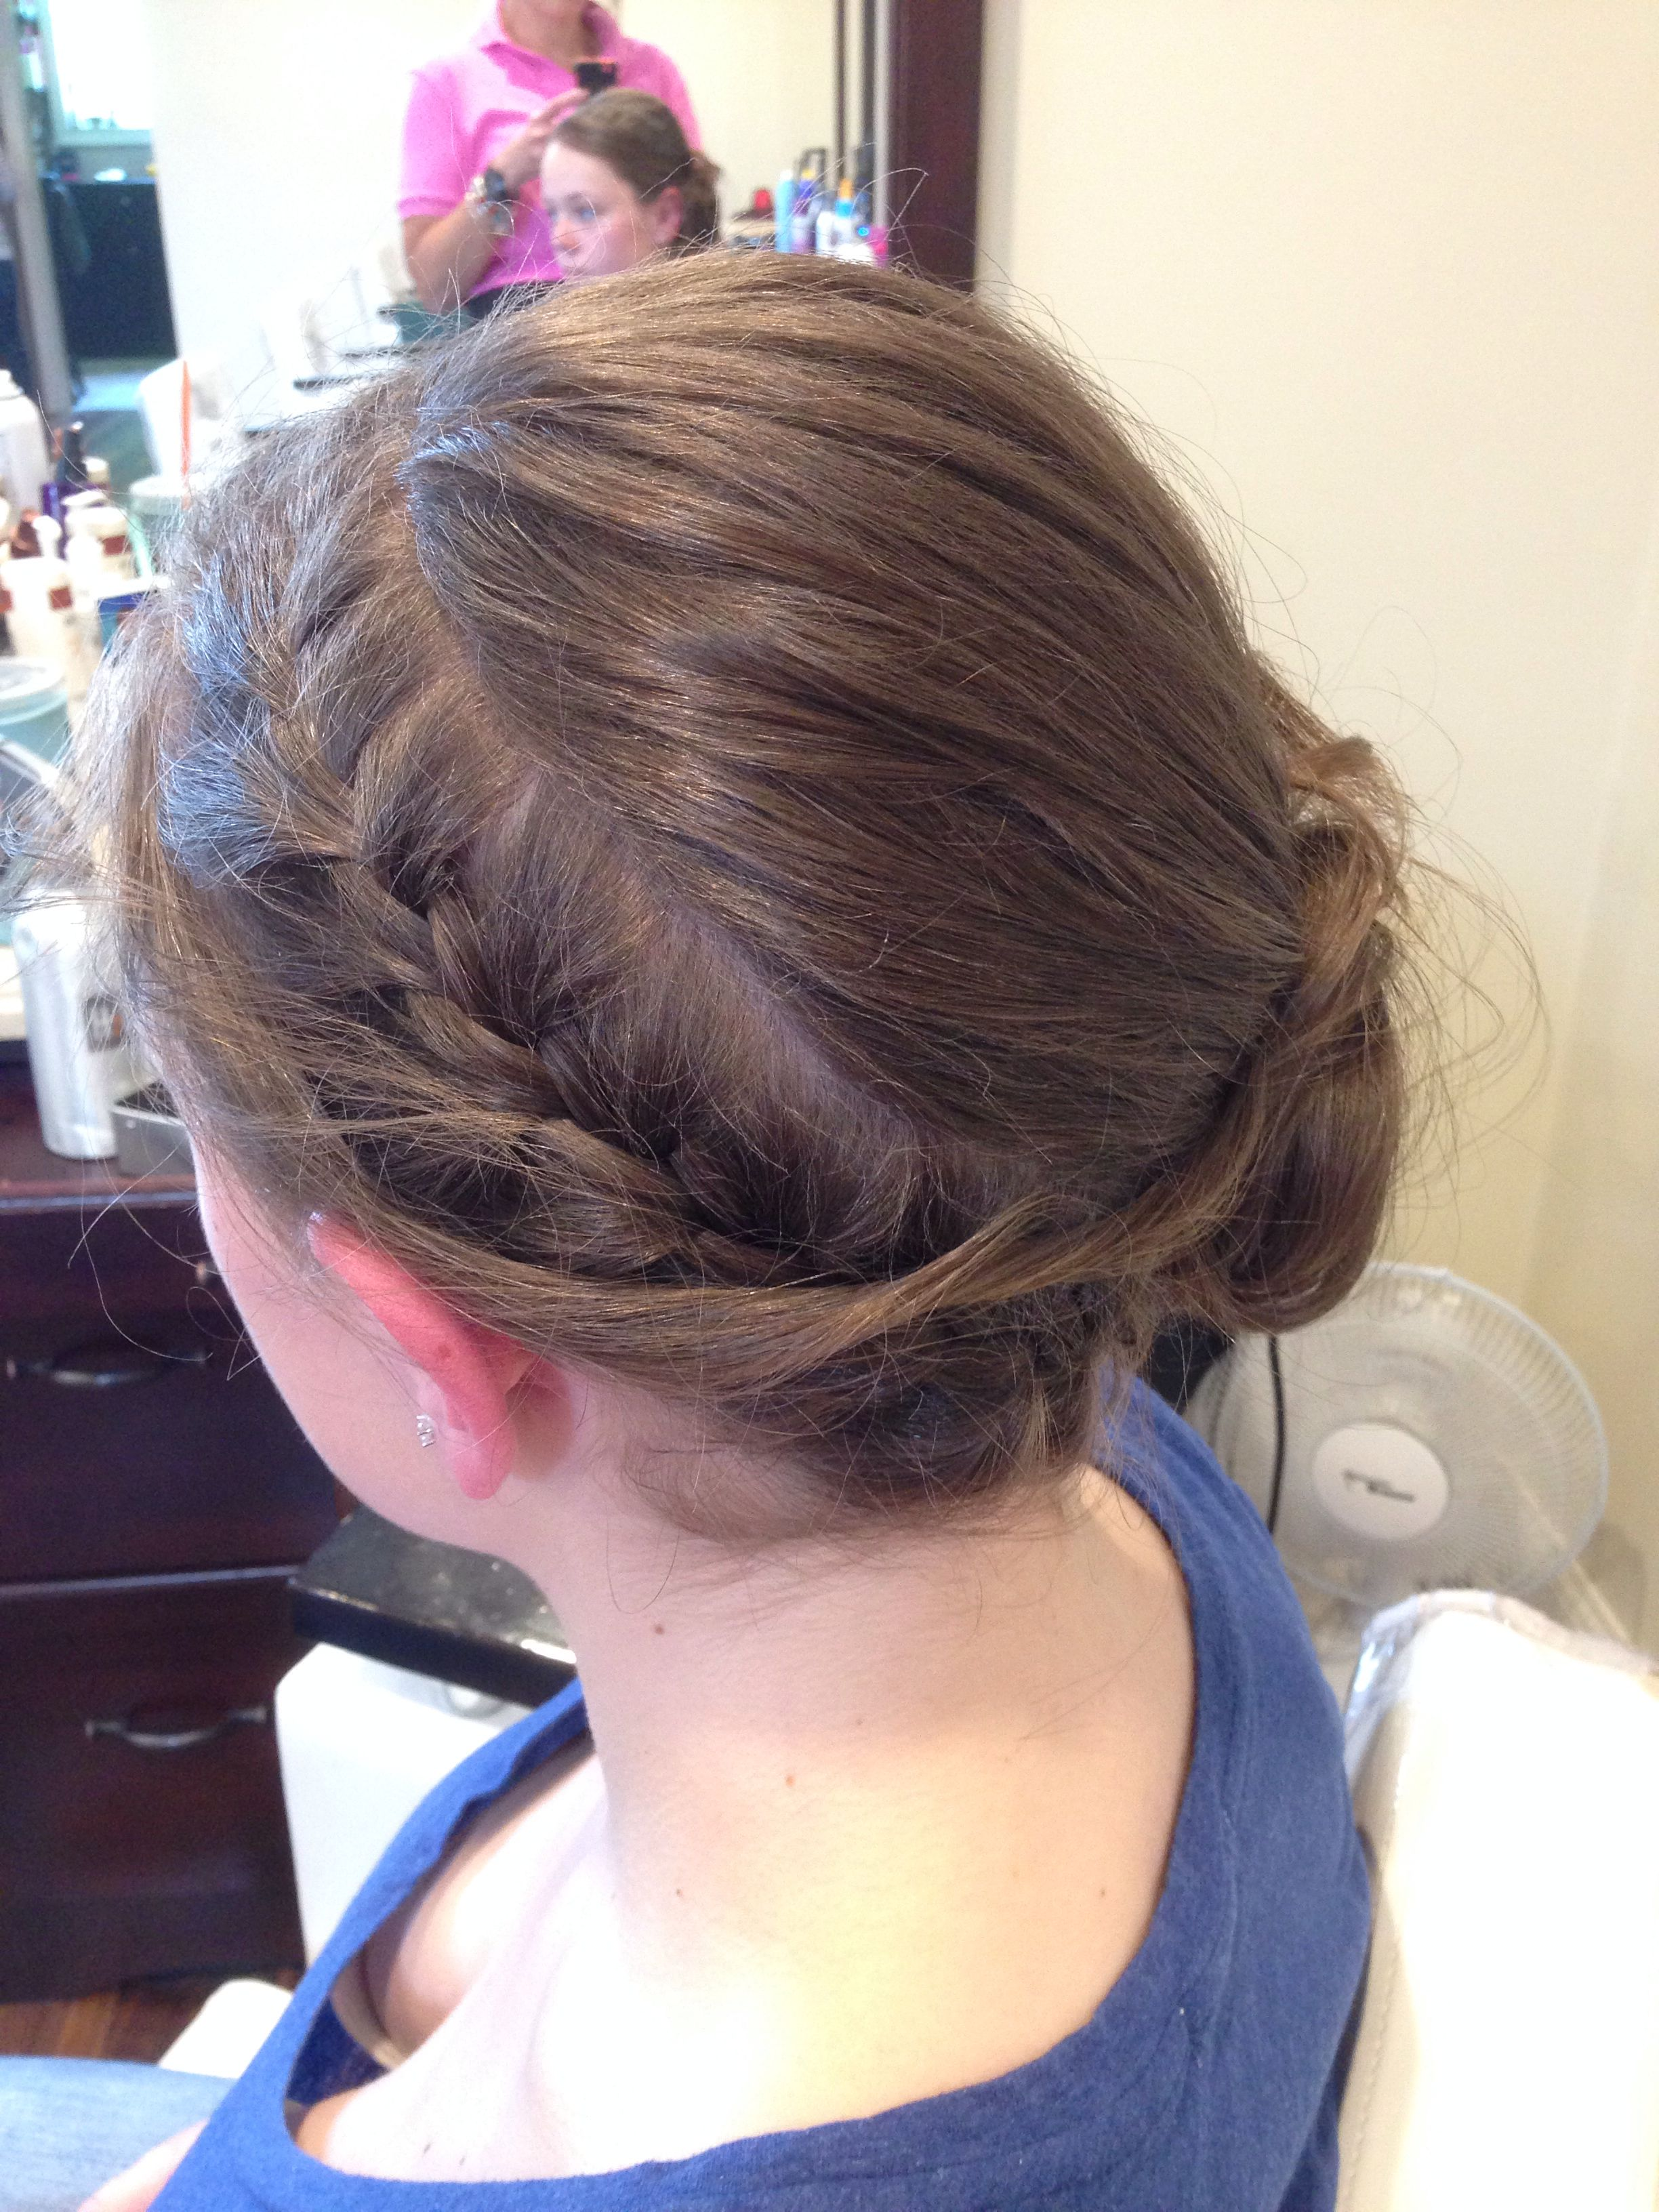 Prom up do braid and bun